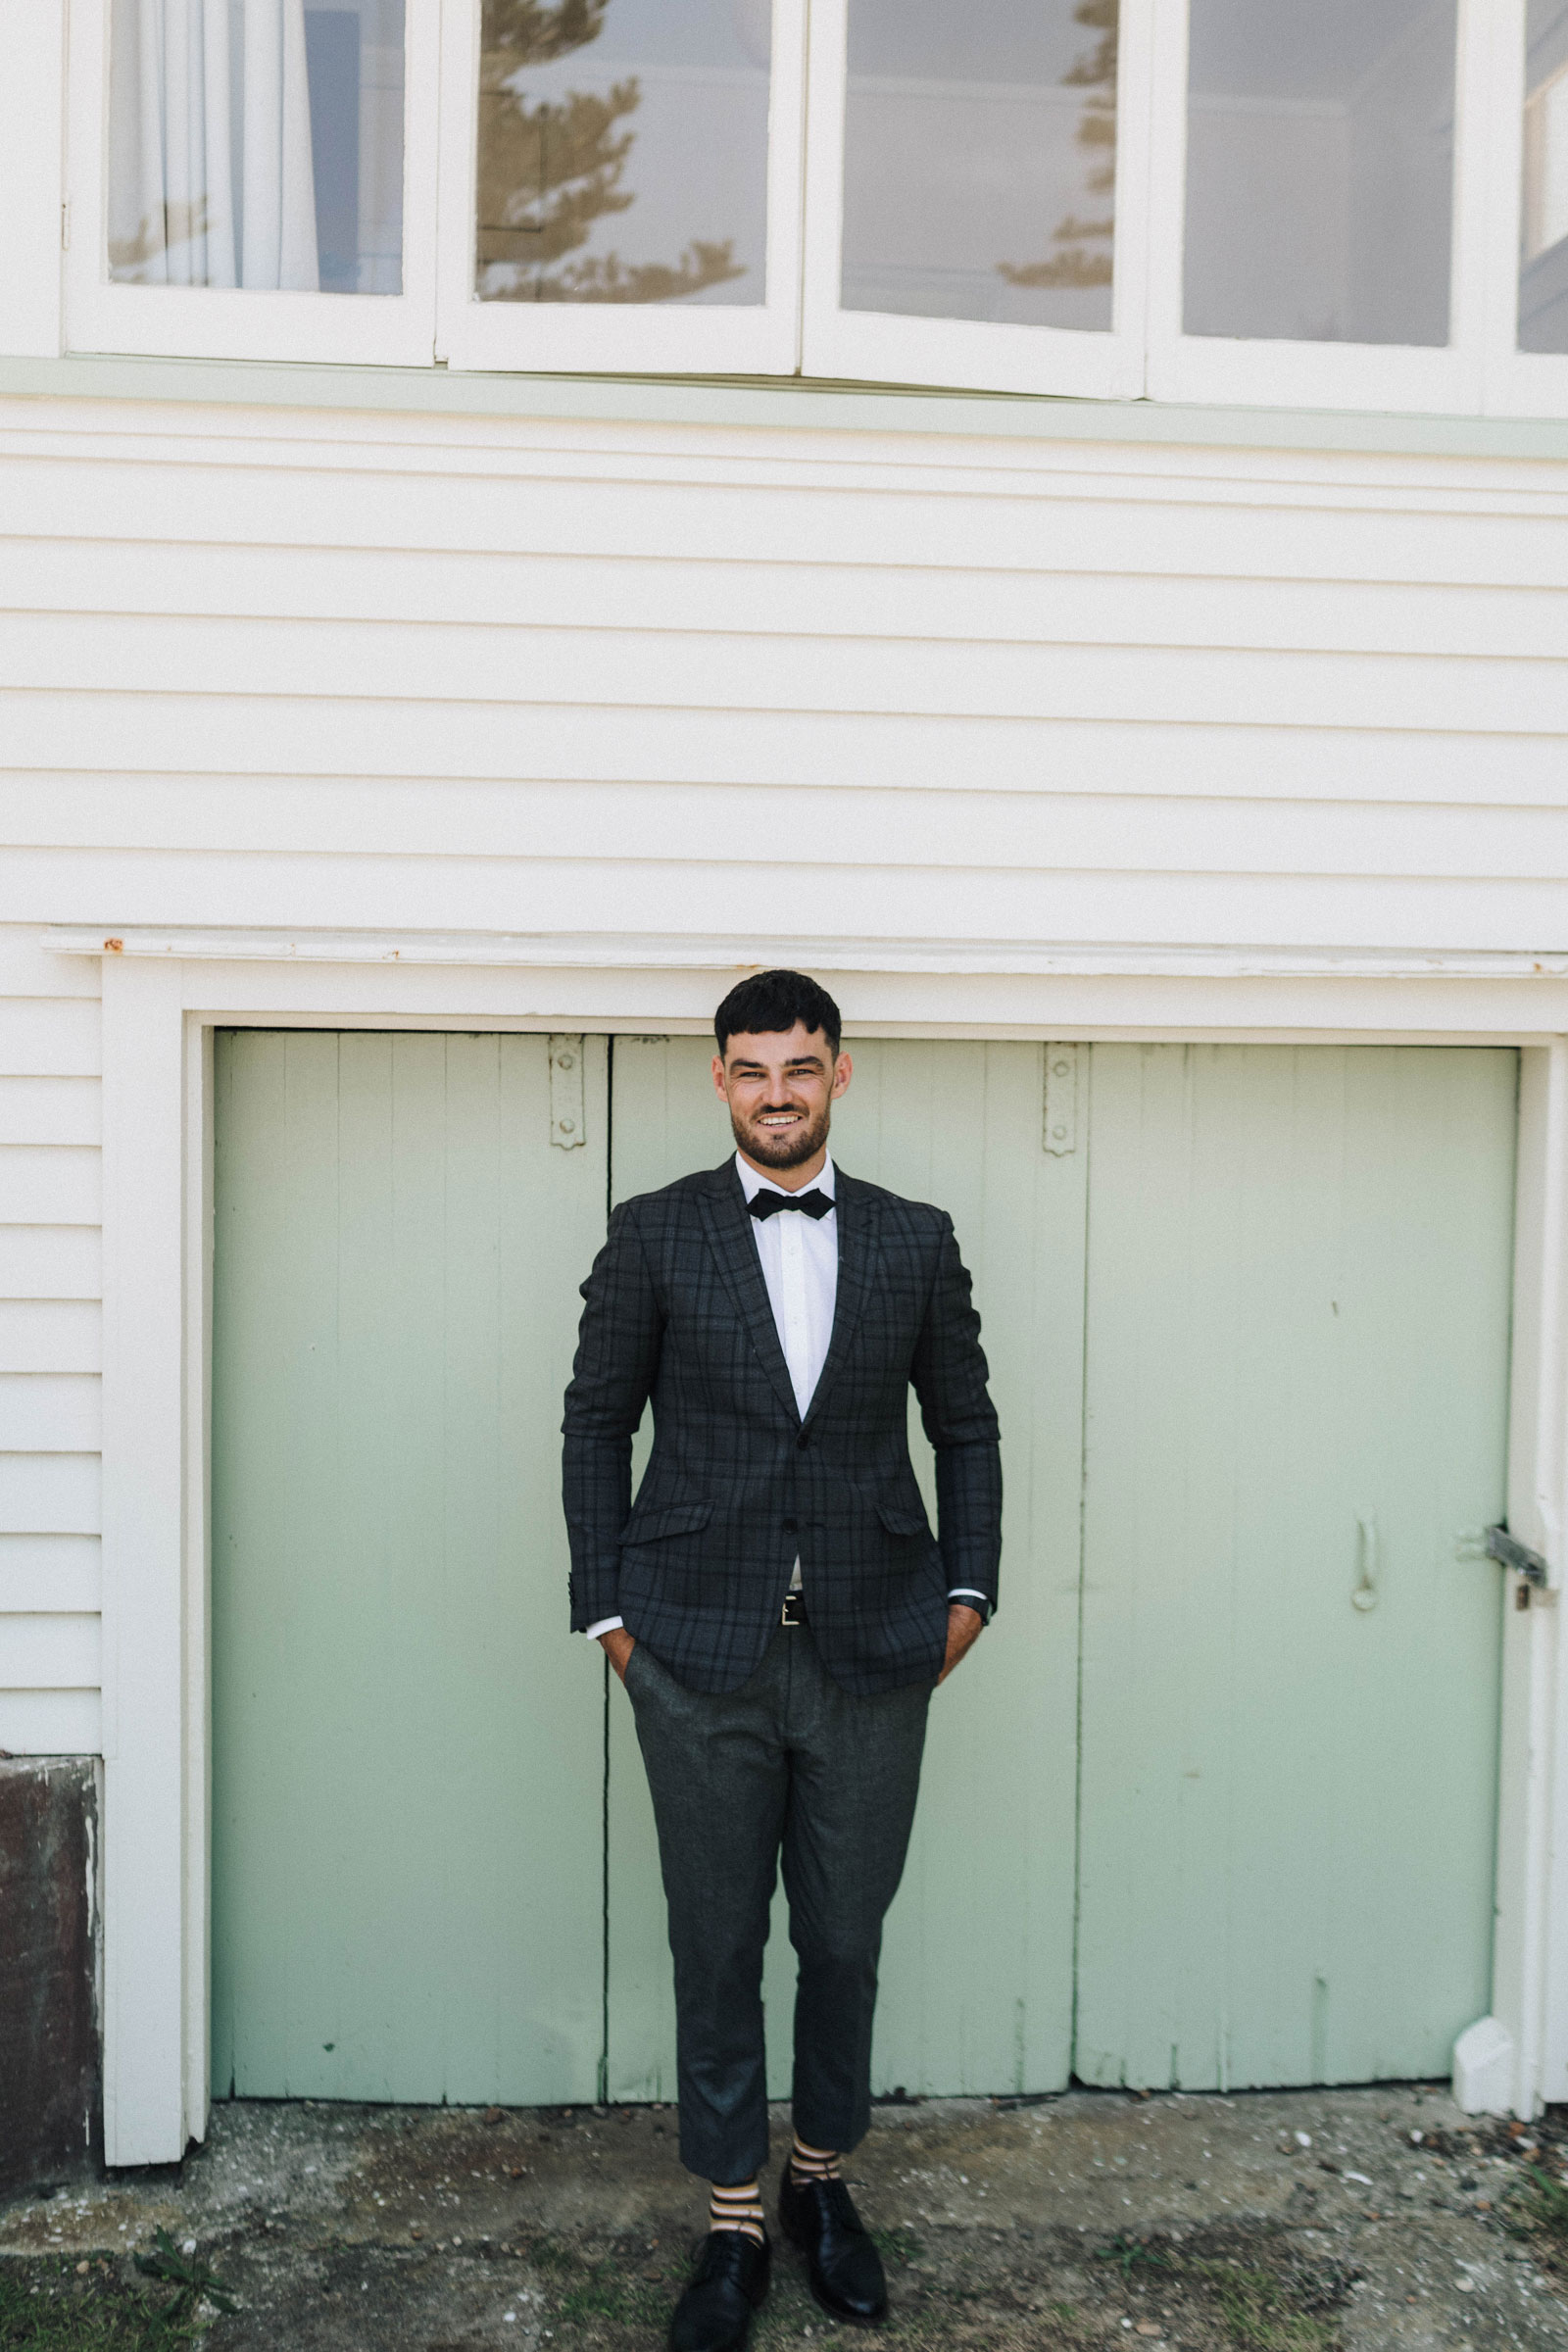 newfound-l-d-tauranga-wedding-photographers-037